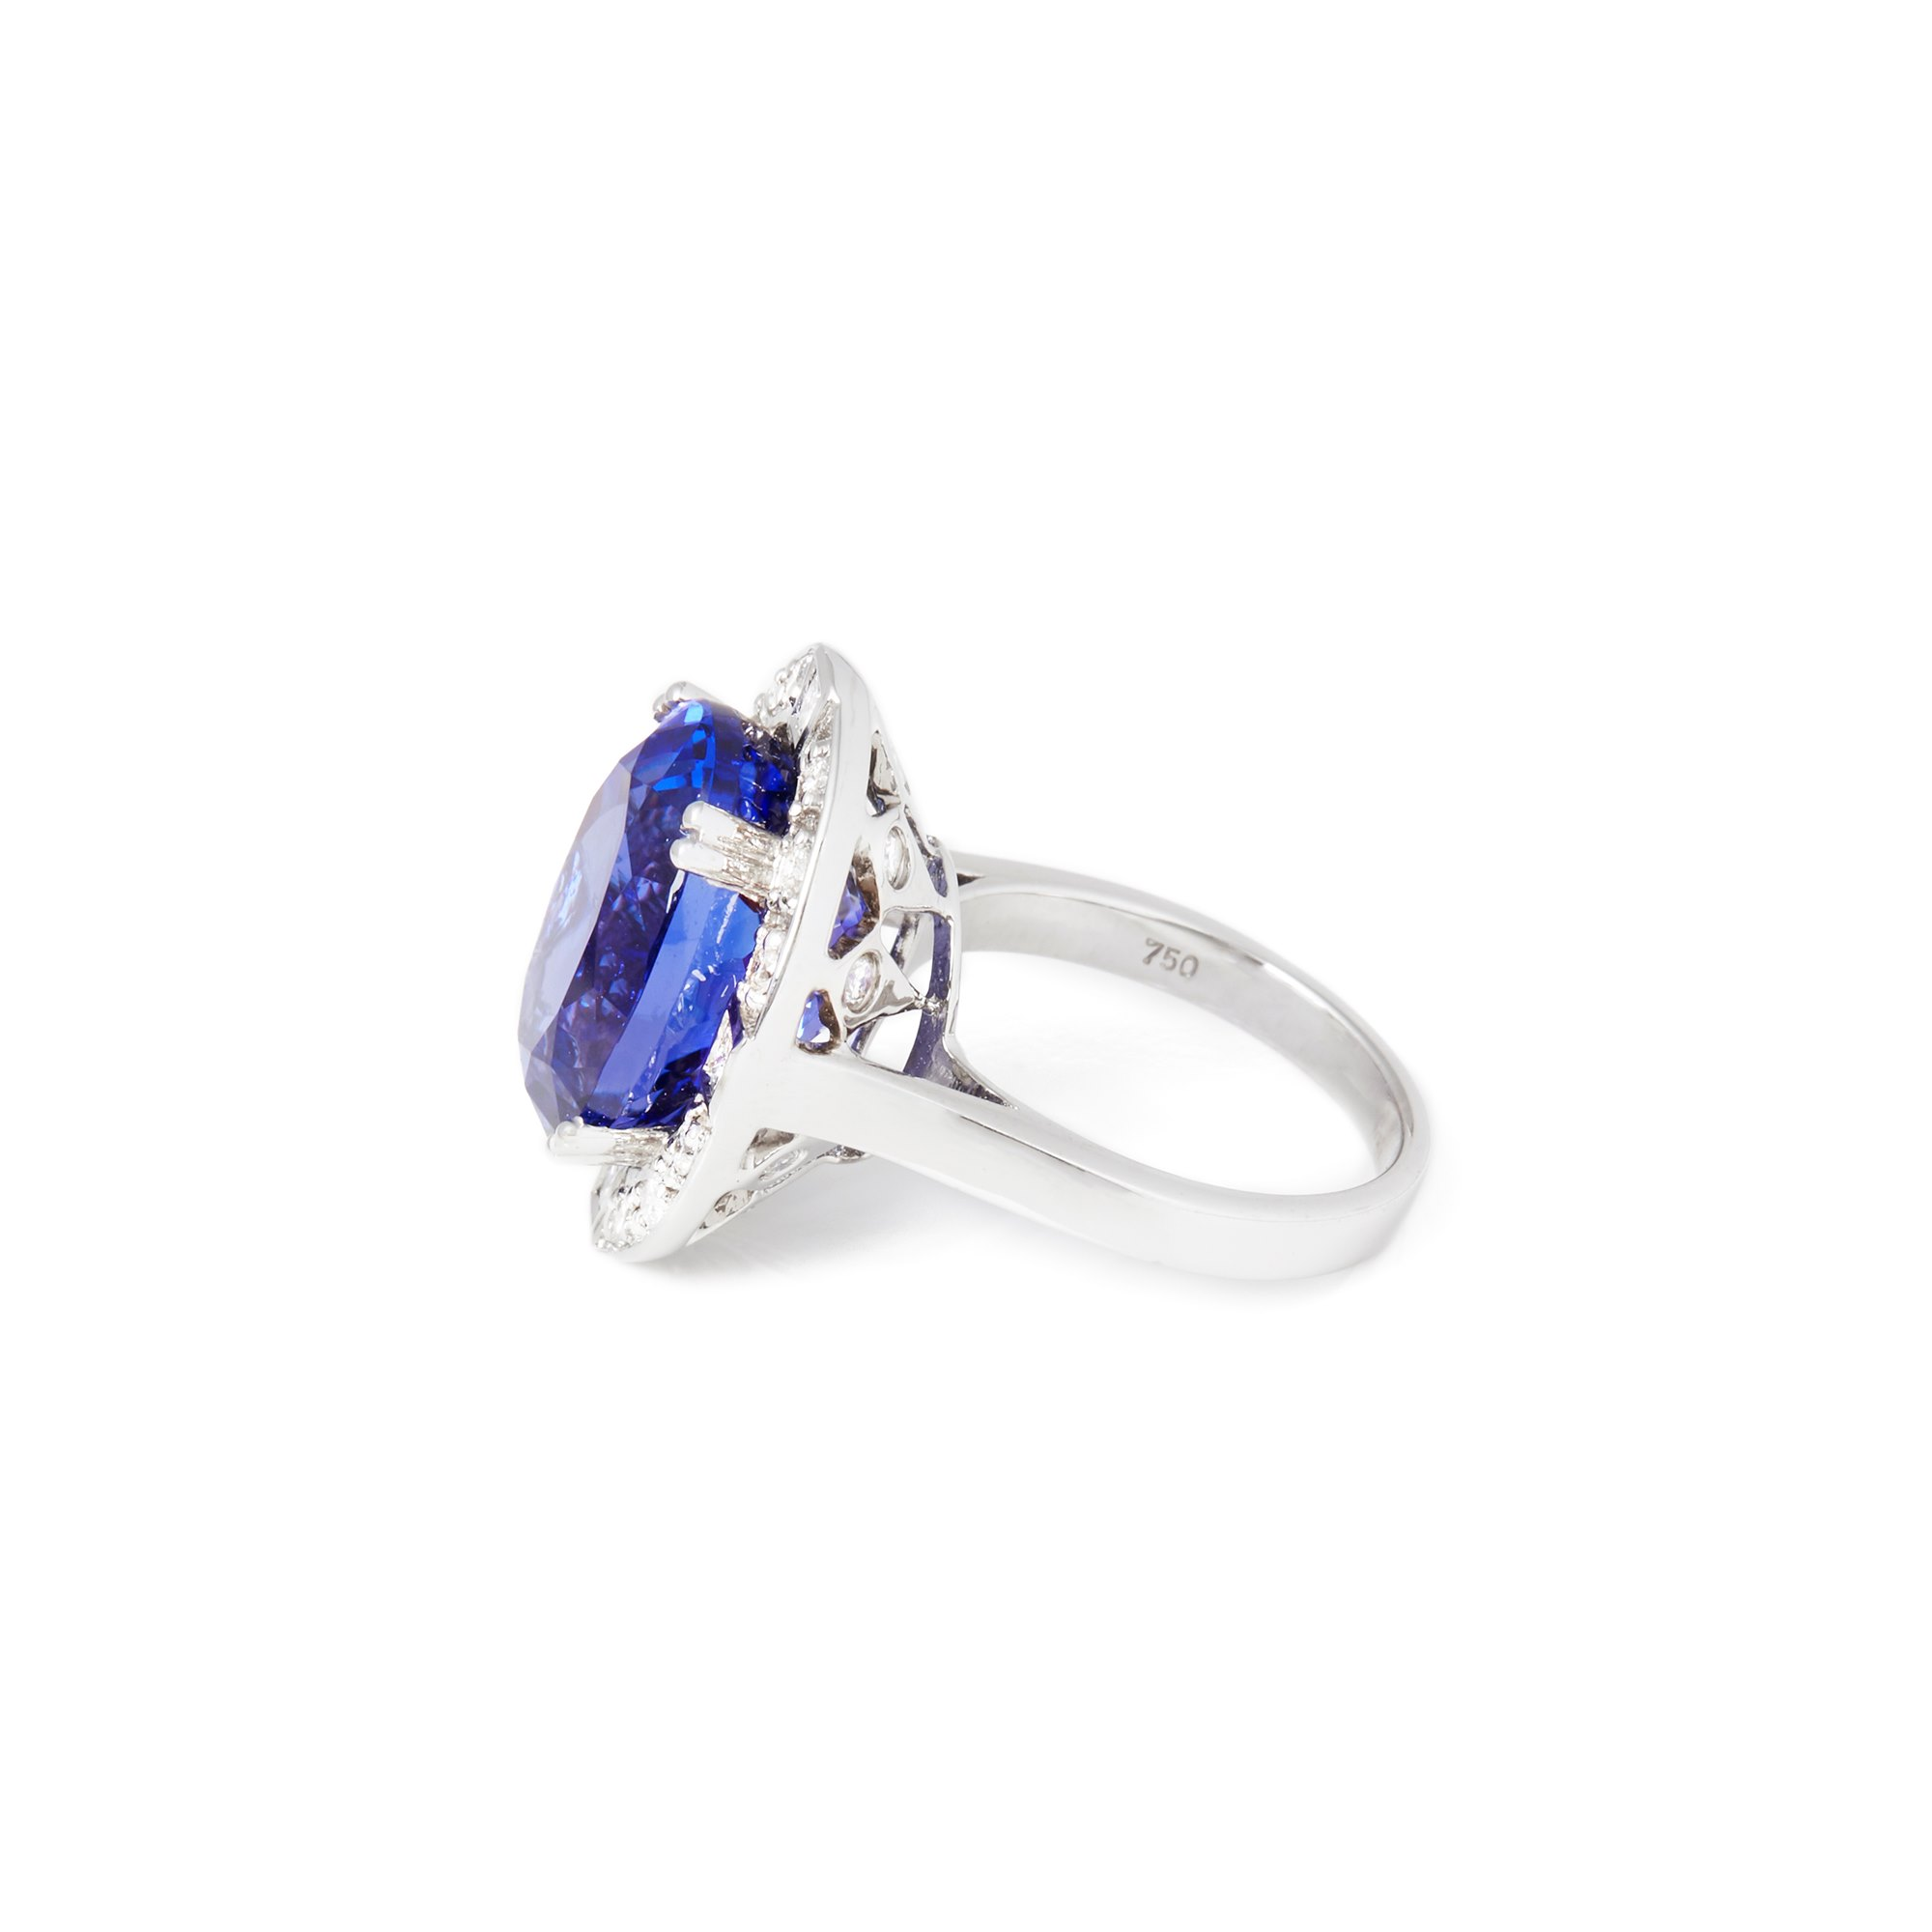 David Jerome Certified 14.35ct Untreated Oval Cut Tanzanite and Diamond Ring